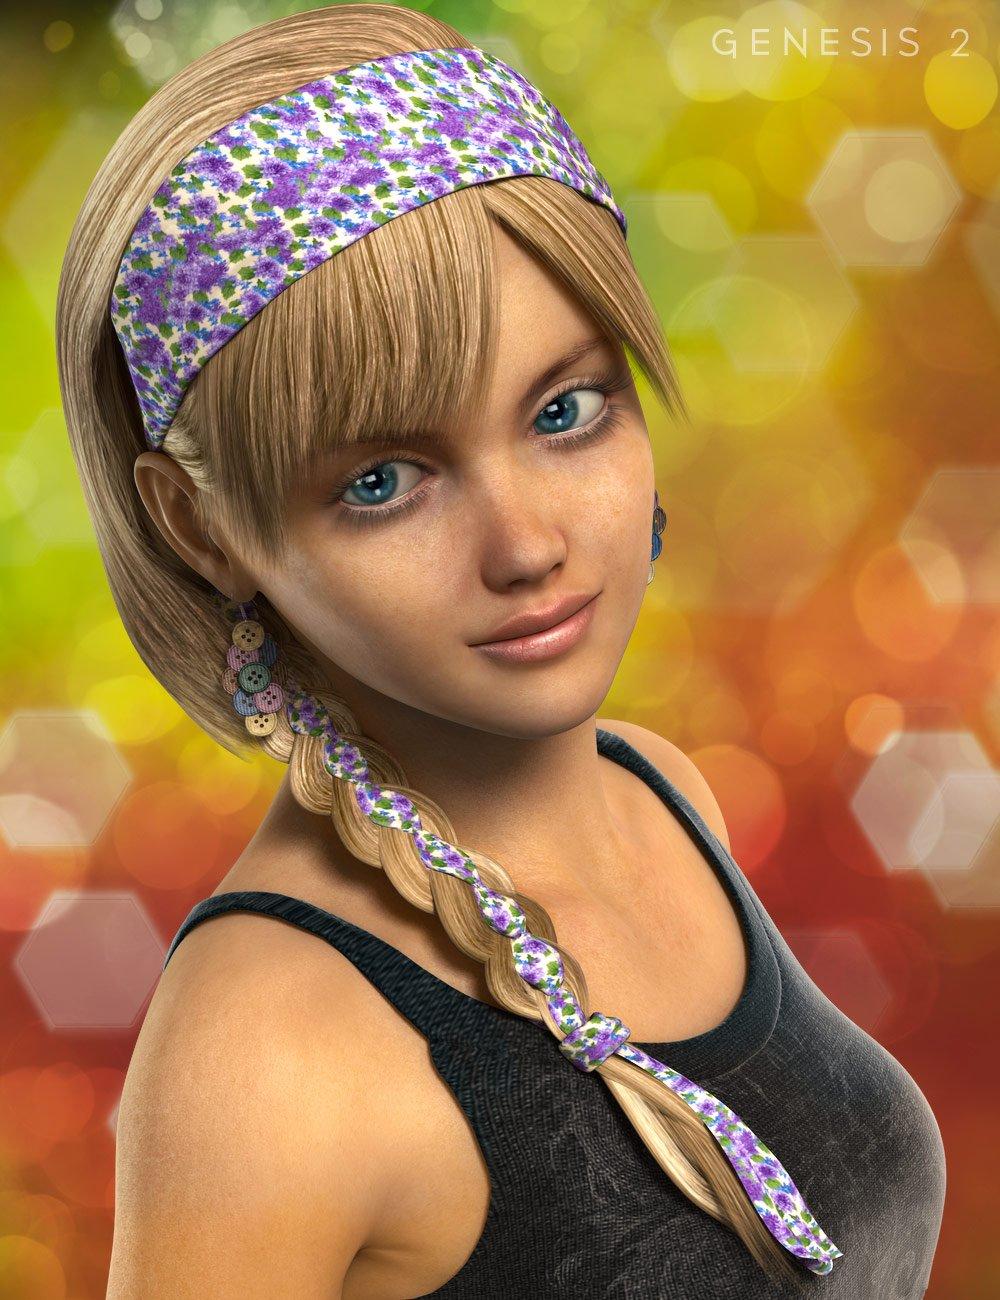 Scarf Braid Hair by: EmmaAndJordi, 3D Models by Daz 3D